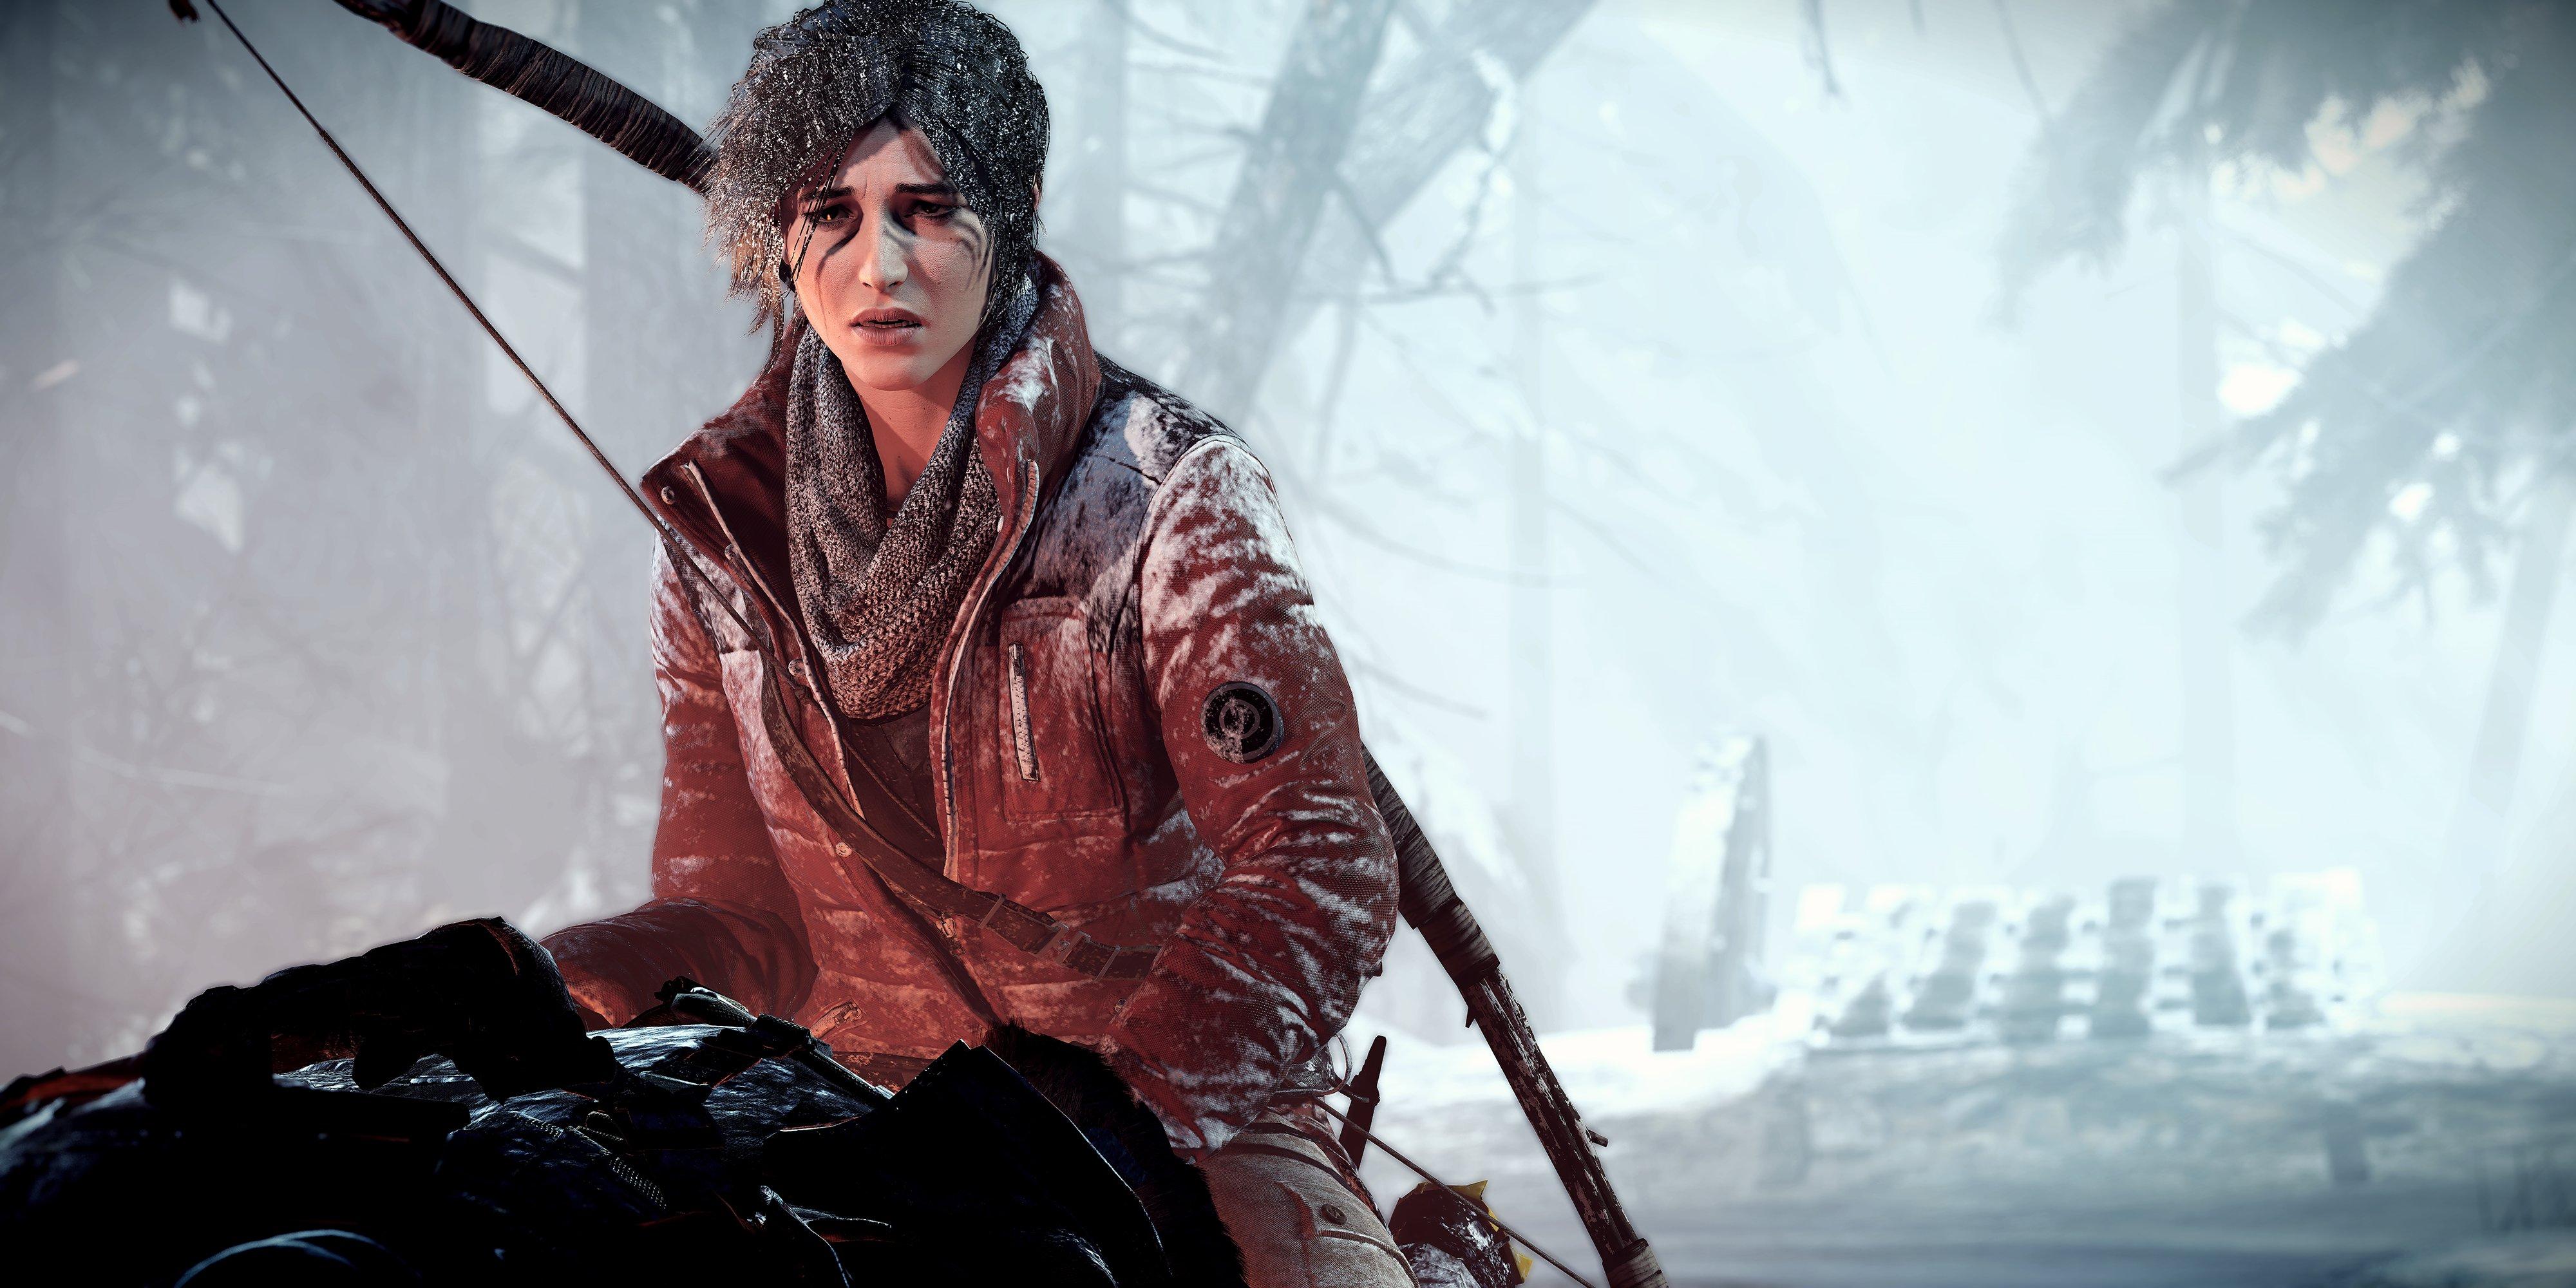 2048x1152 Lara Croft Shadow Of The Tomb Raider Game